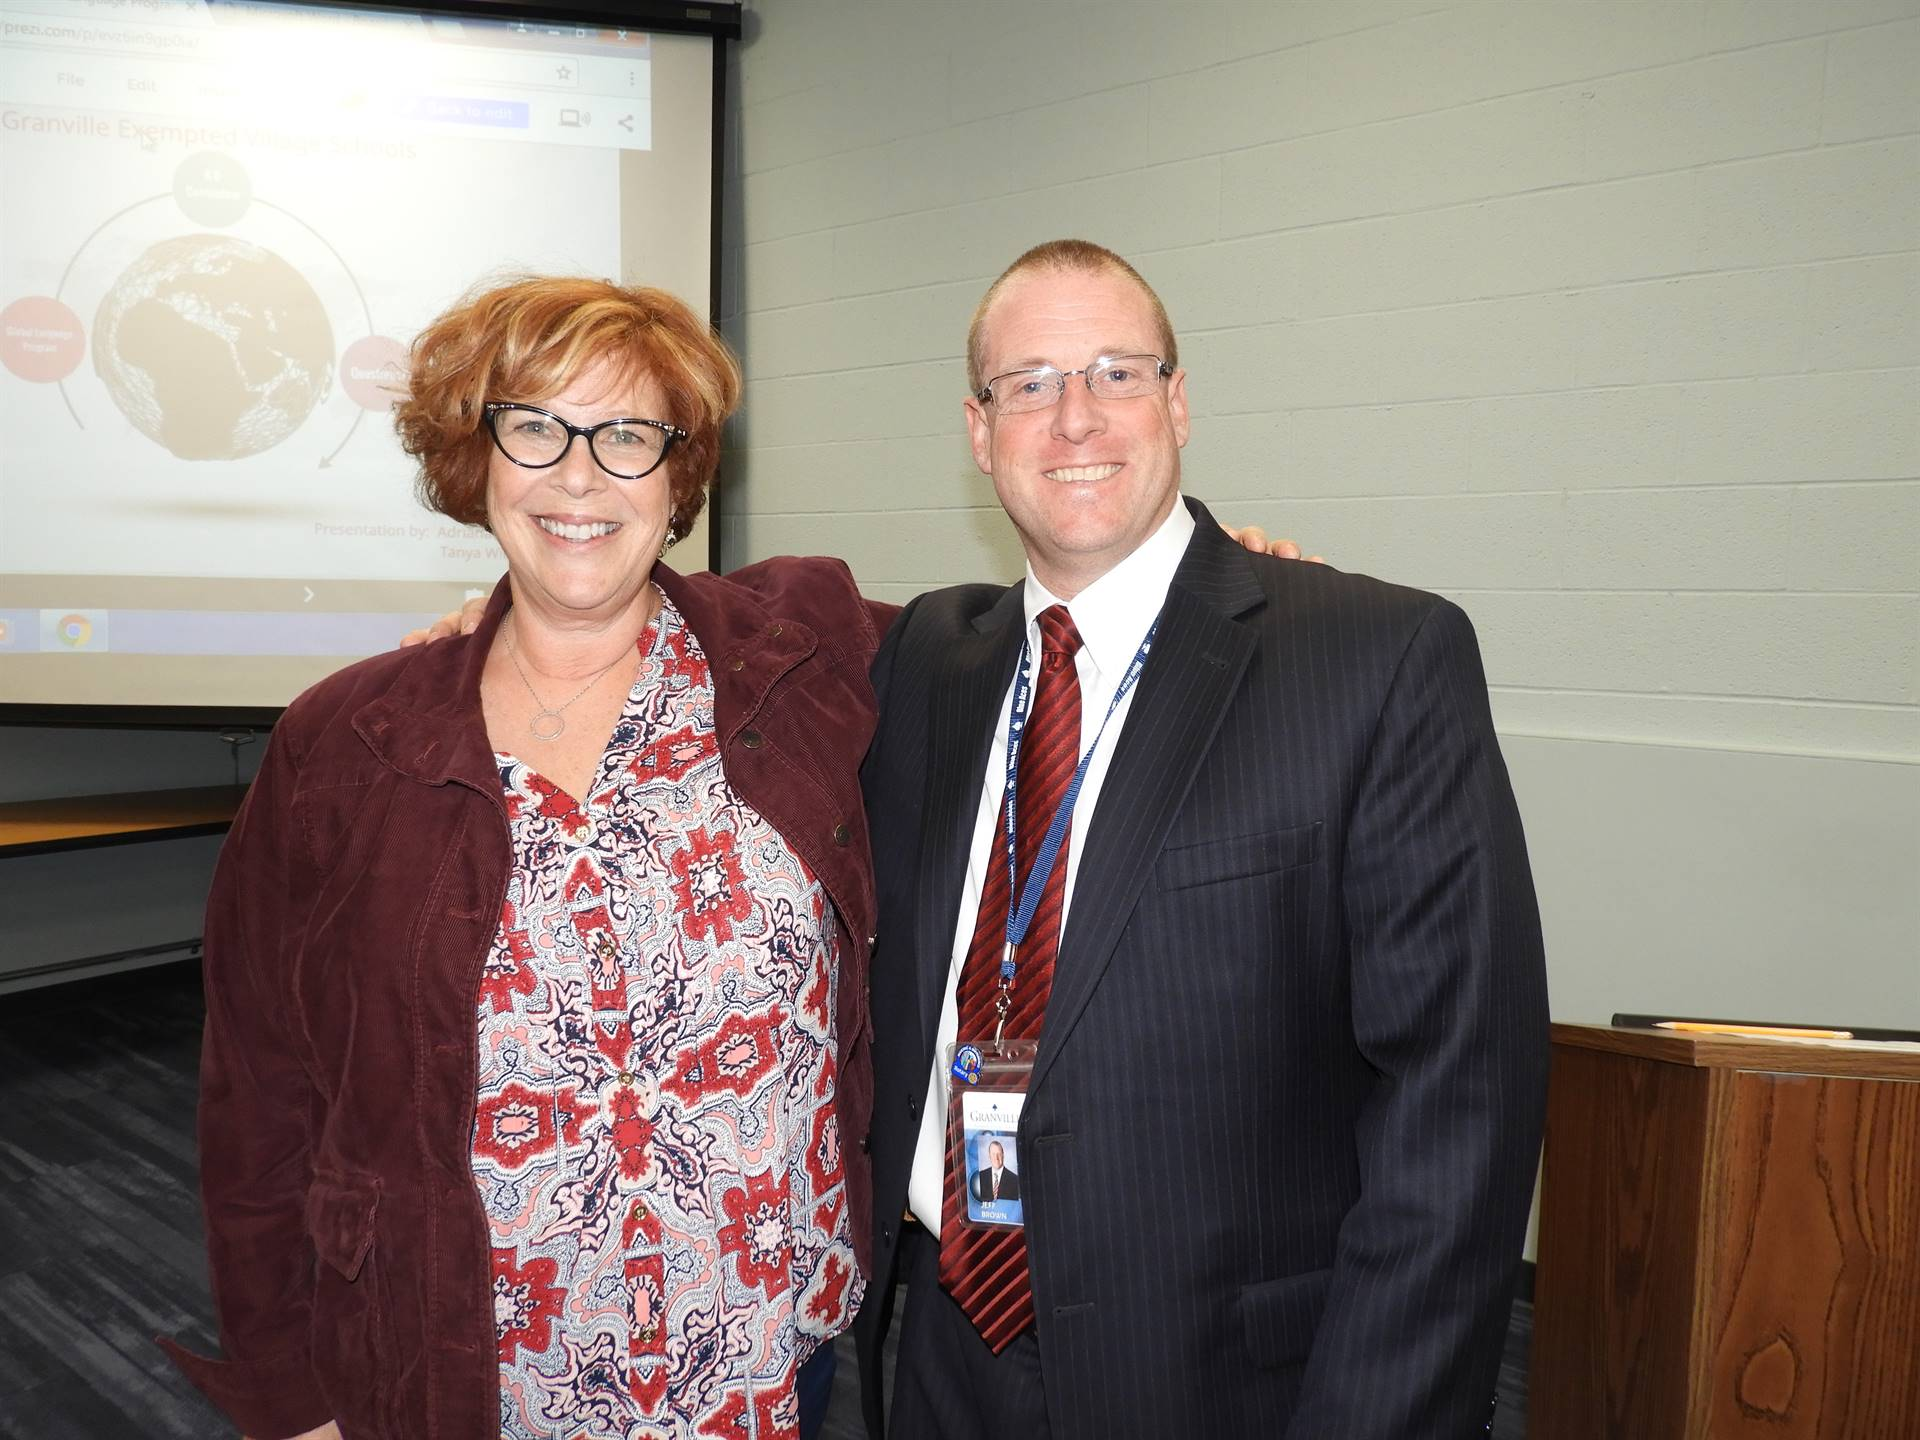 GIS Counselor Tammy Breymaier